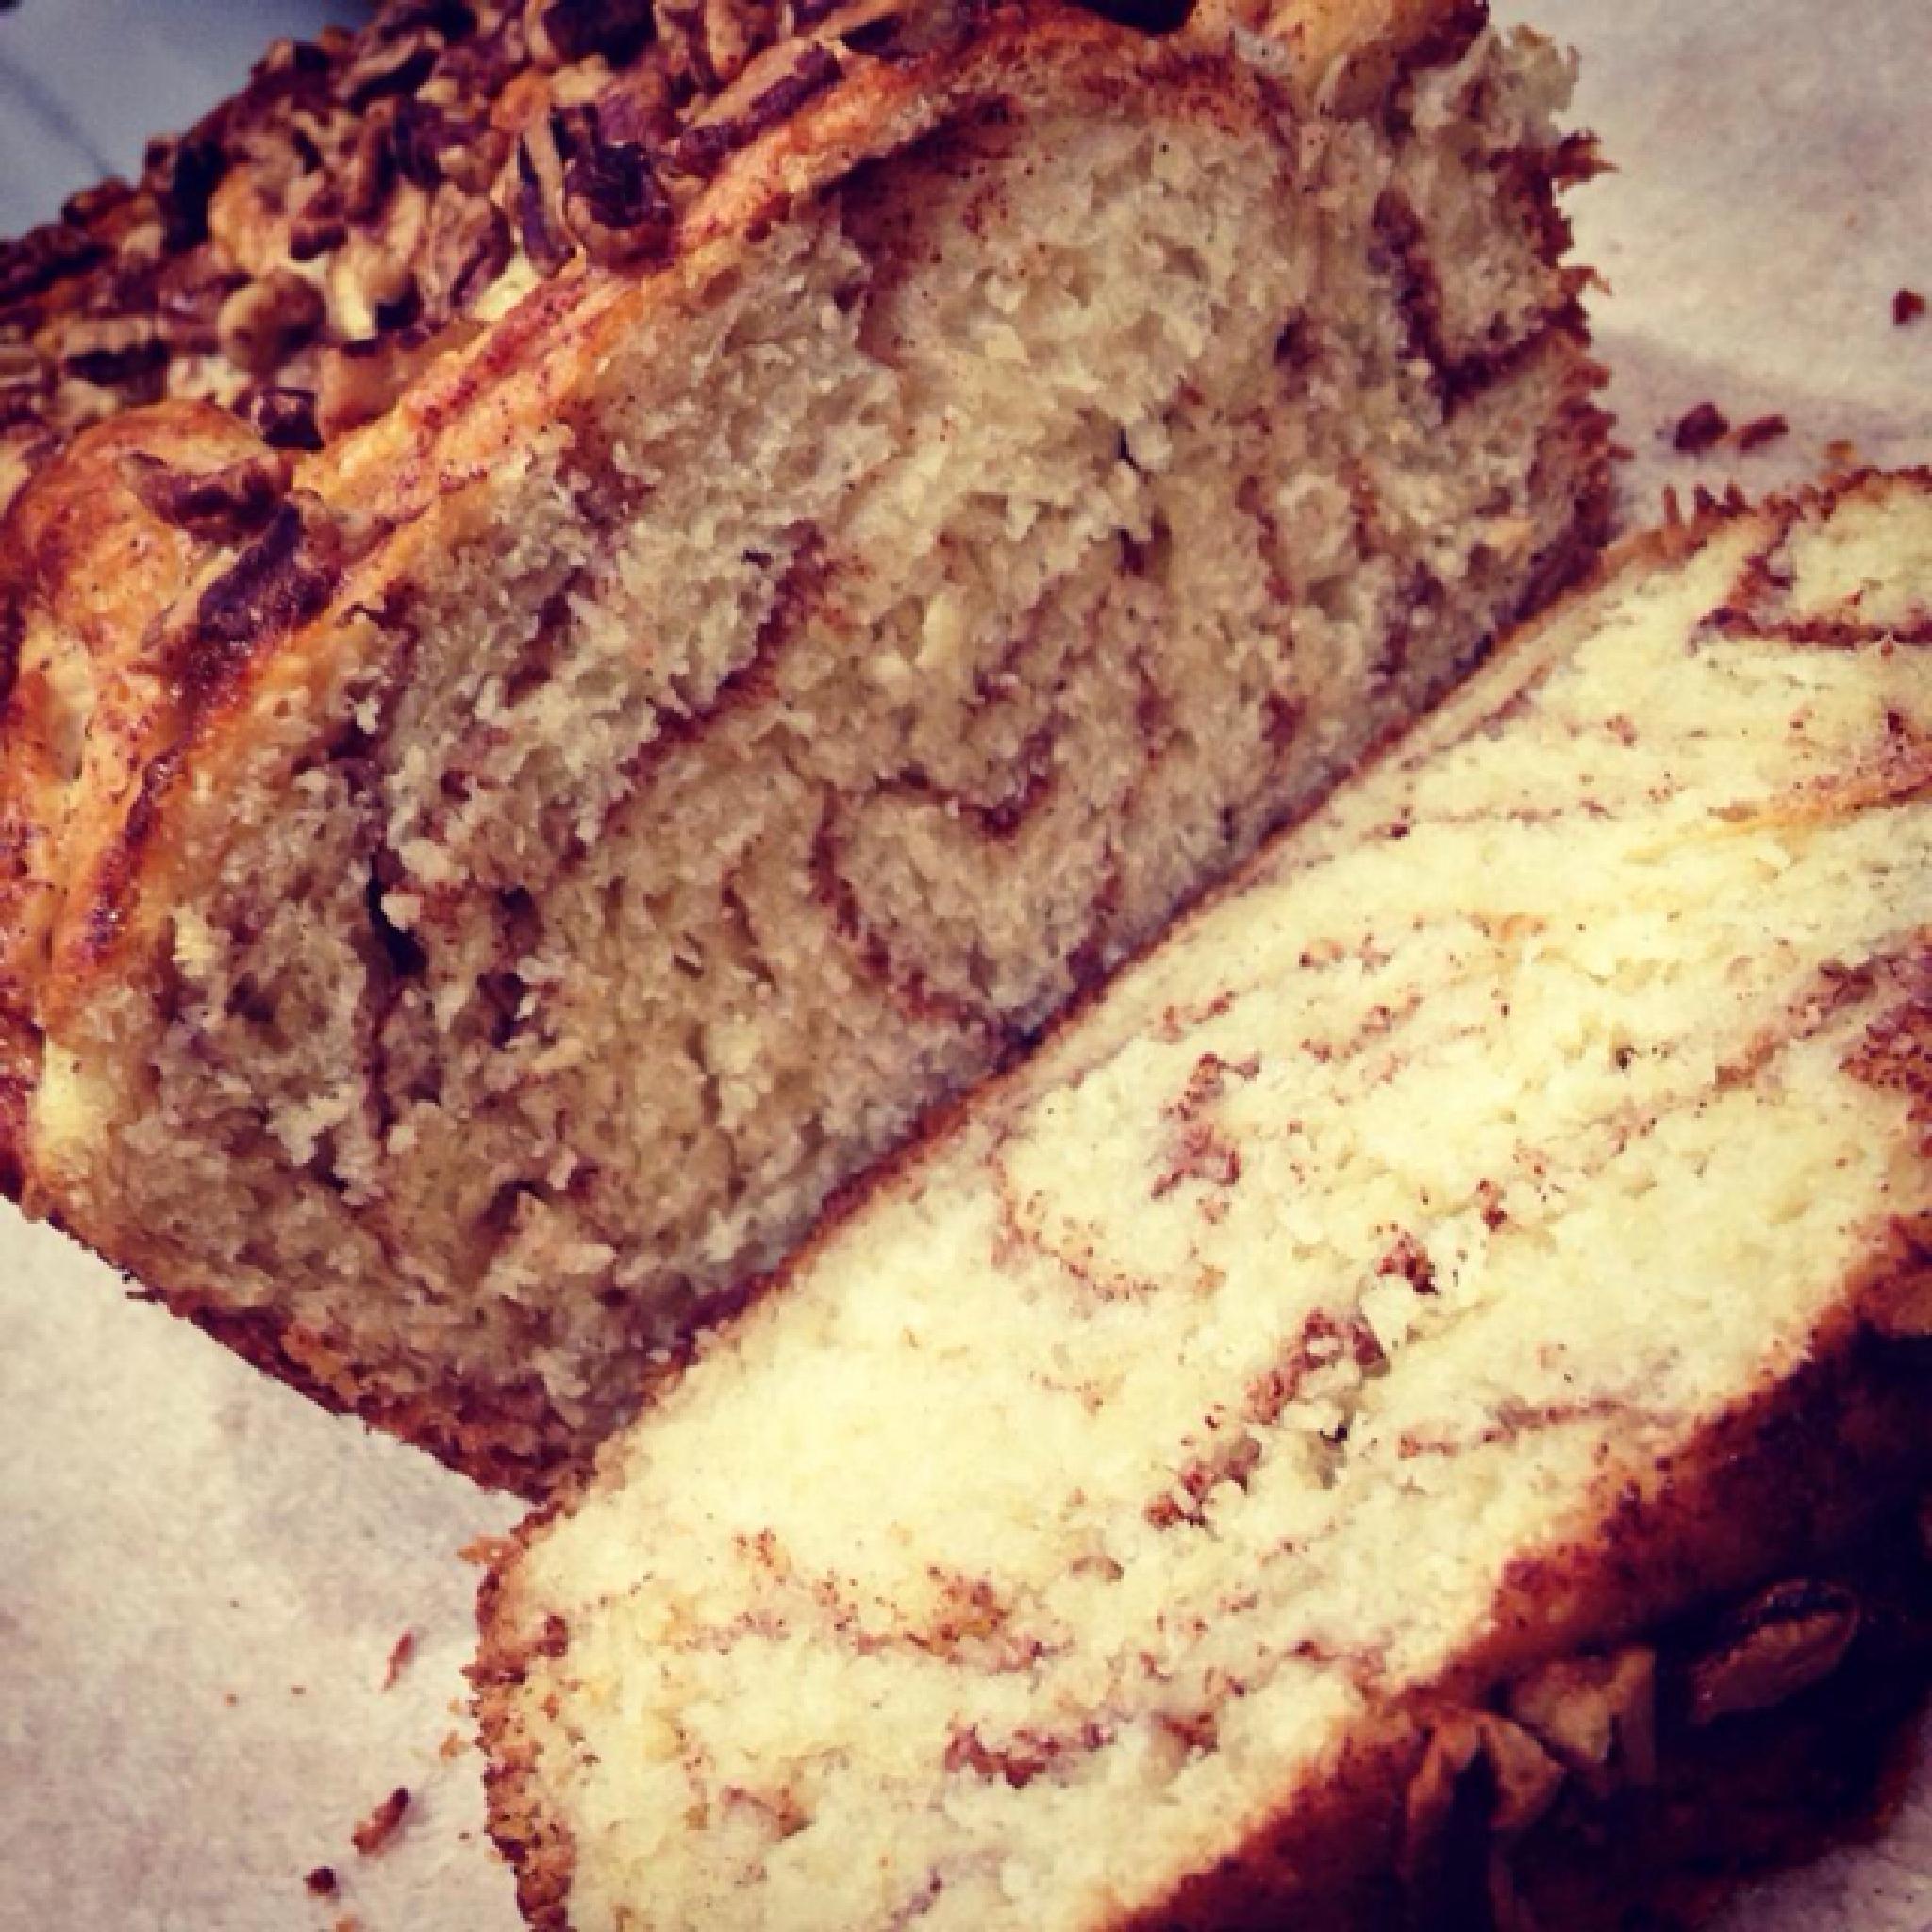 cinnamon swirl bread by Saif